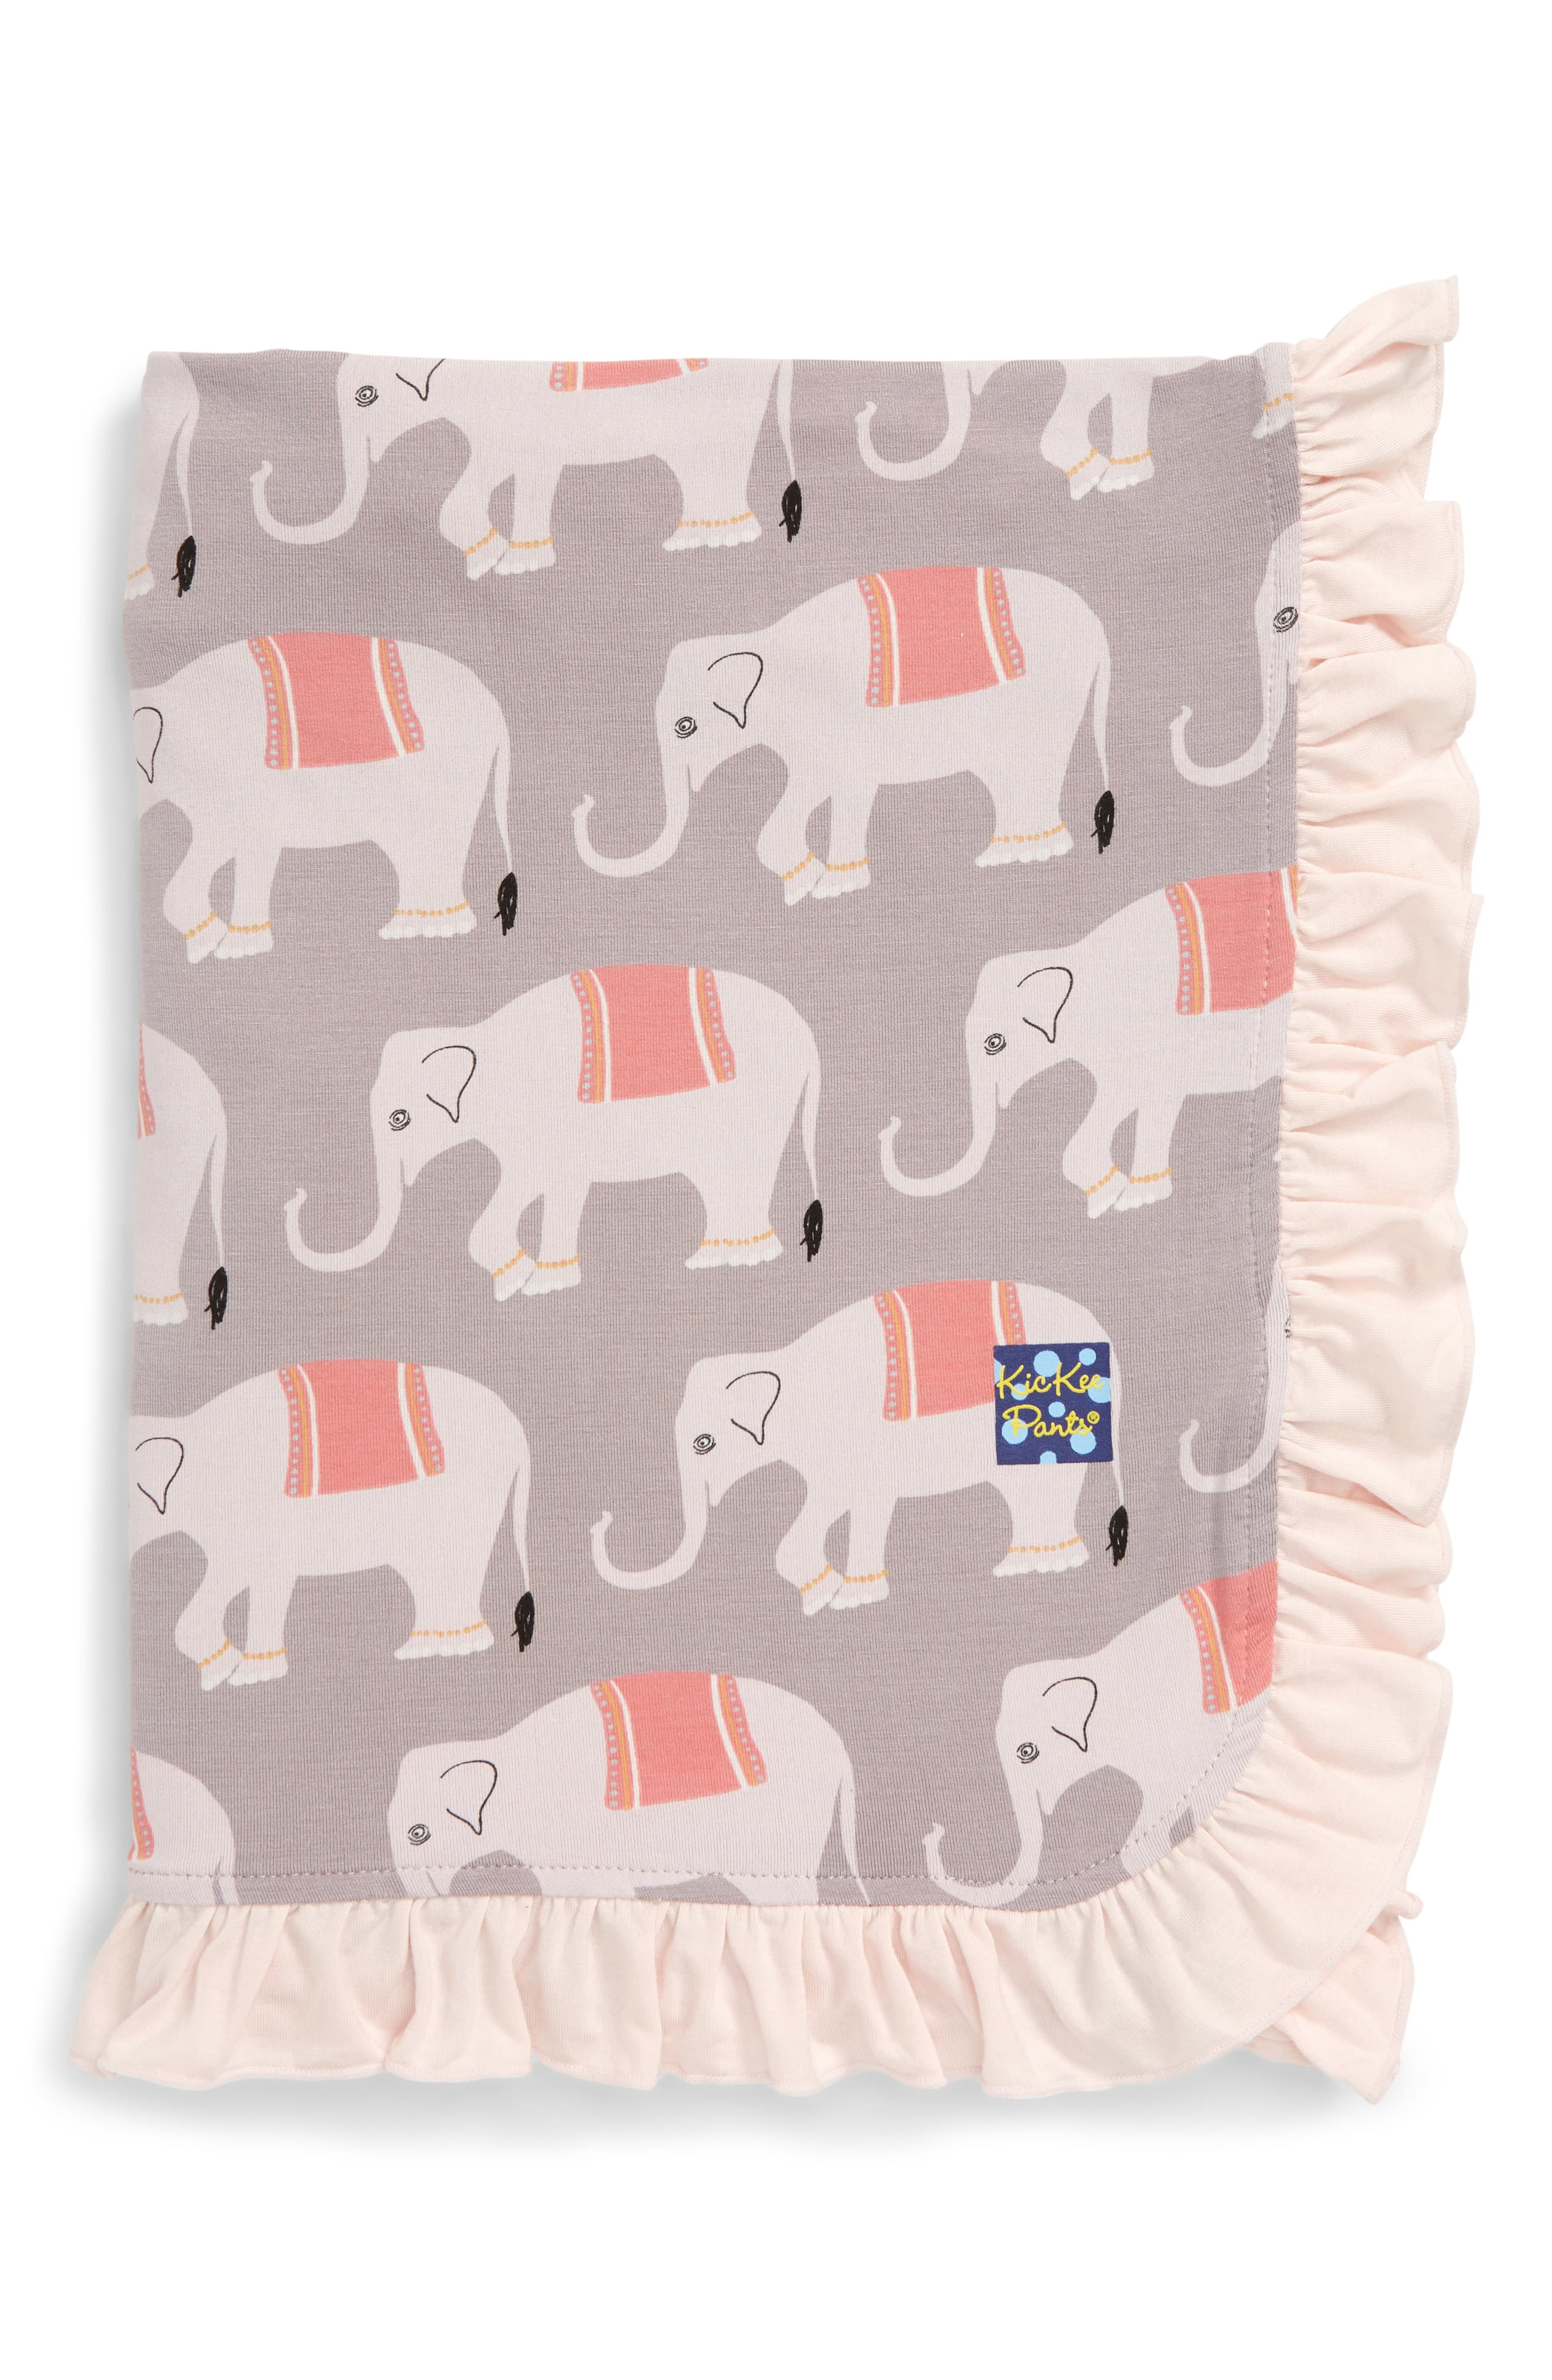 Kickee Pants Elephant Ruffle Stroller Blanket Baby Stroller Blanket Nursery Accessories Baby Crib Bedding